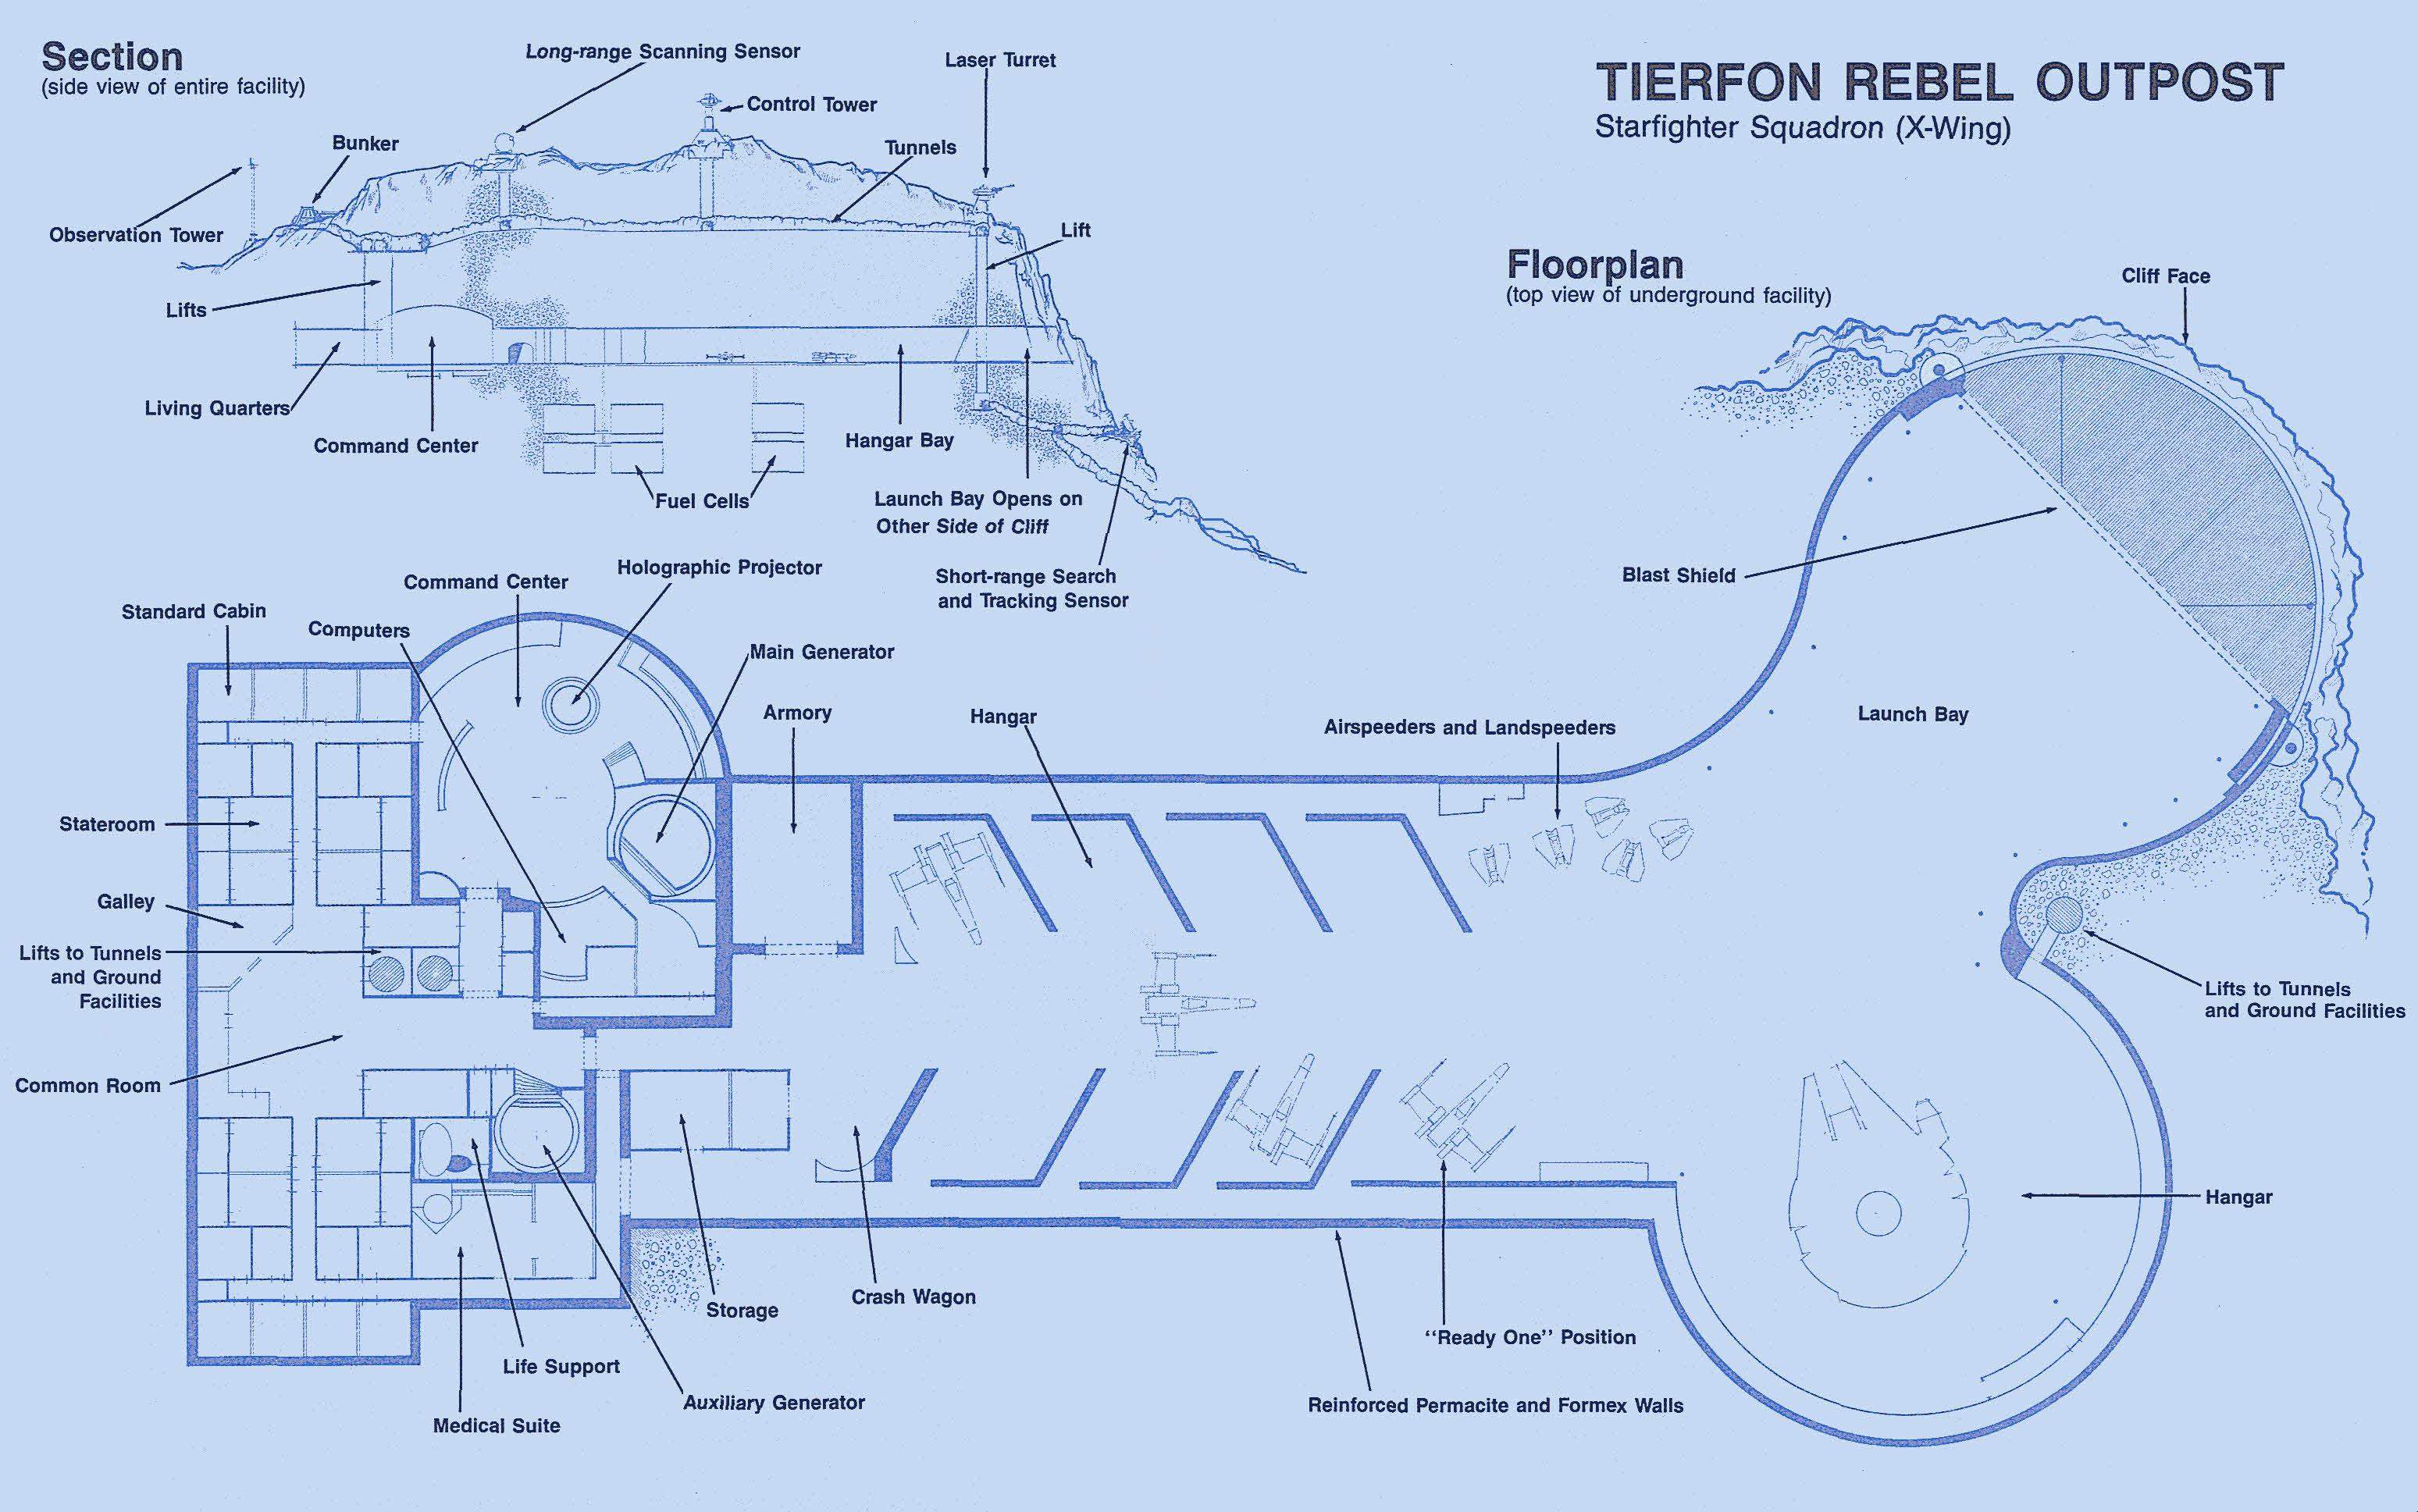 TSWSB-TierfonRebelBase.jpg